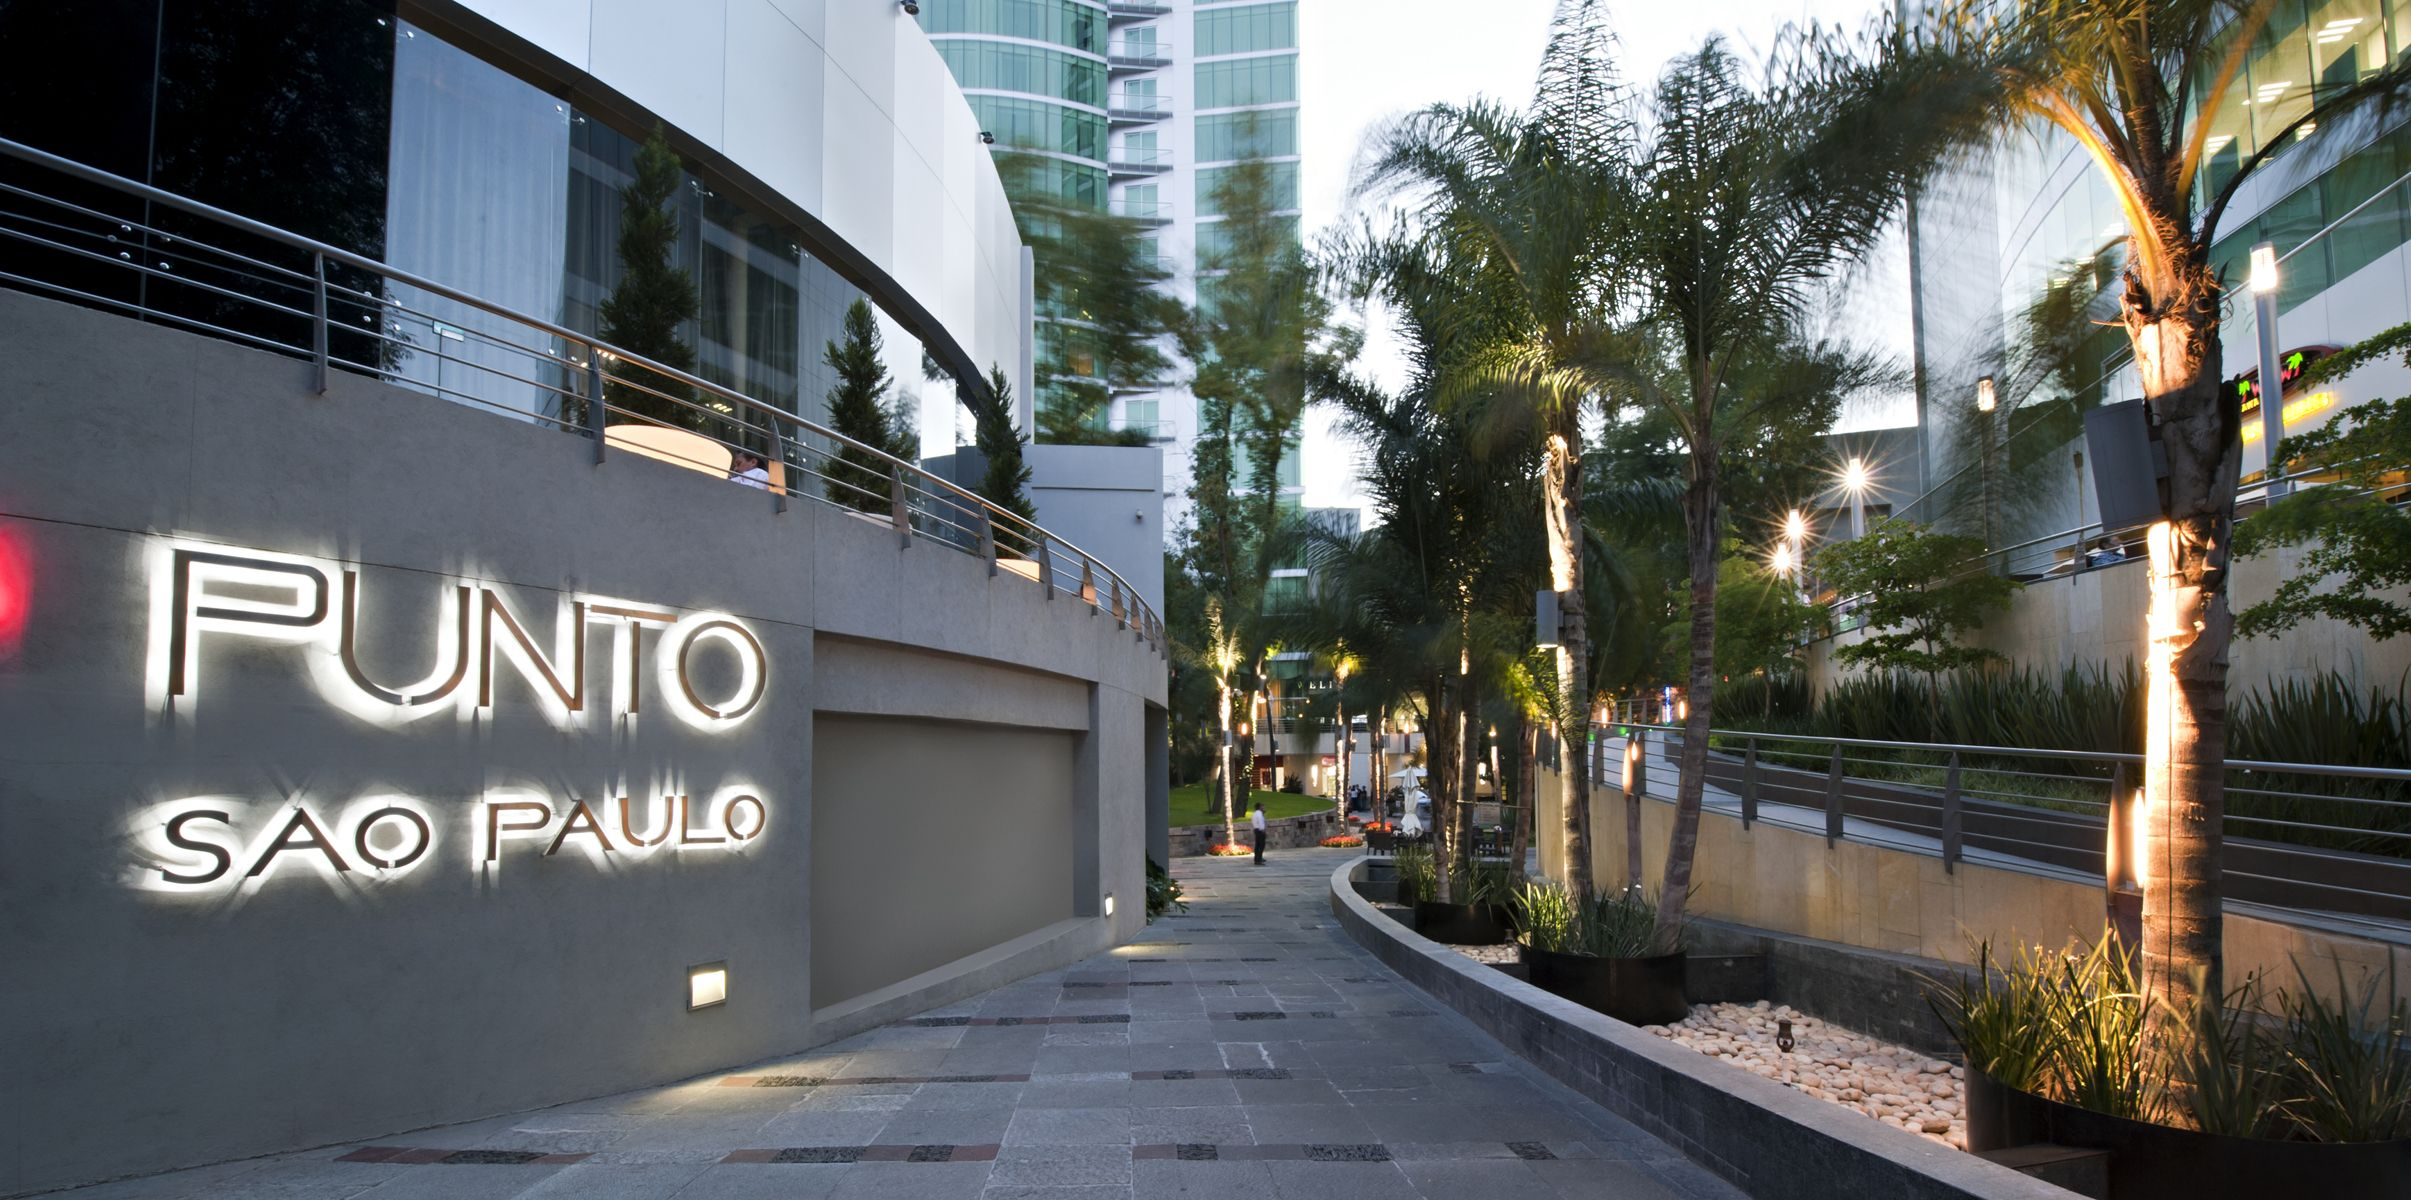 Iluminacion Exterior en Punto Sao Paulo  Iluminacin Exterior  Iluminacin Iluminacin Exterior Guadalajara